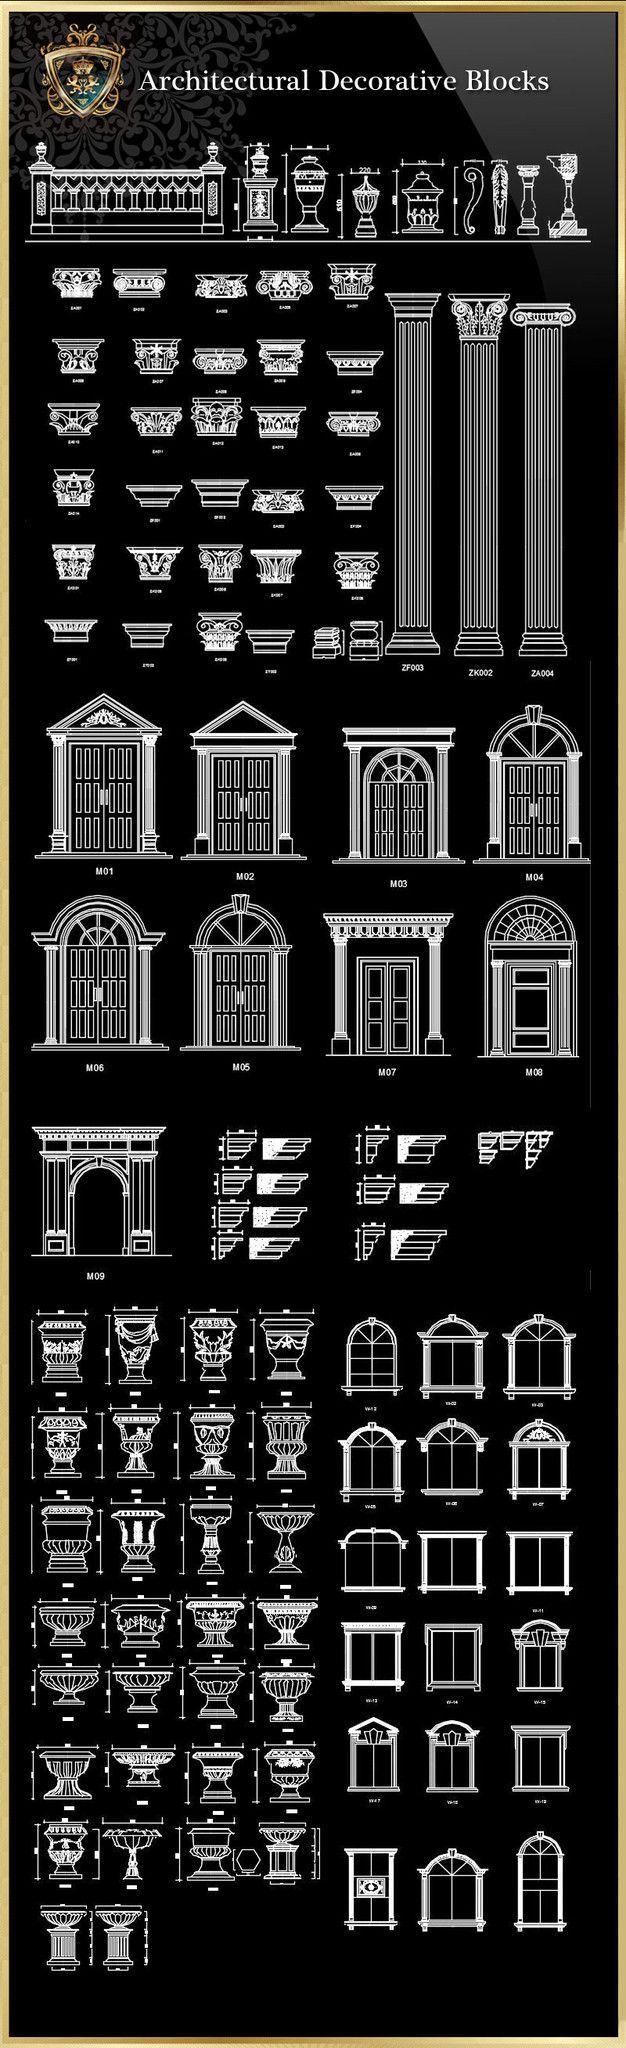 Royal Architecture Decorative Blocks Cad Design Free